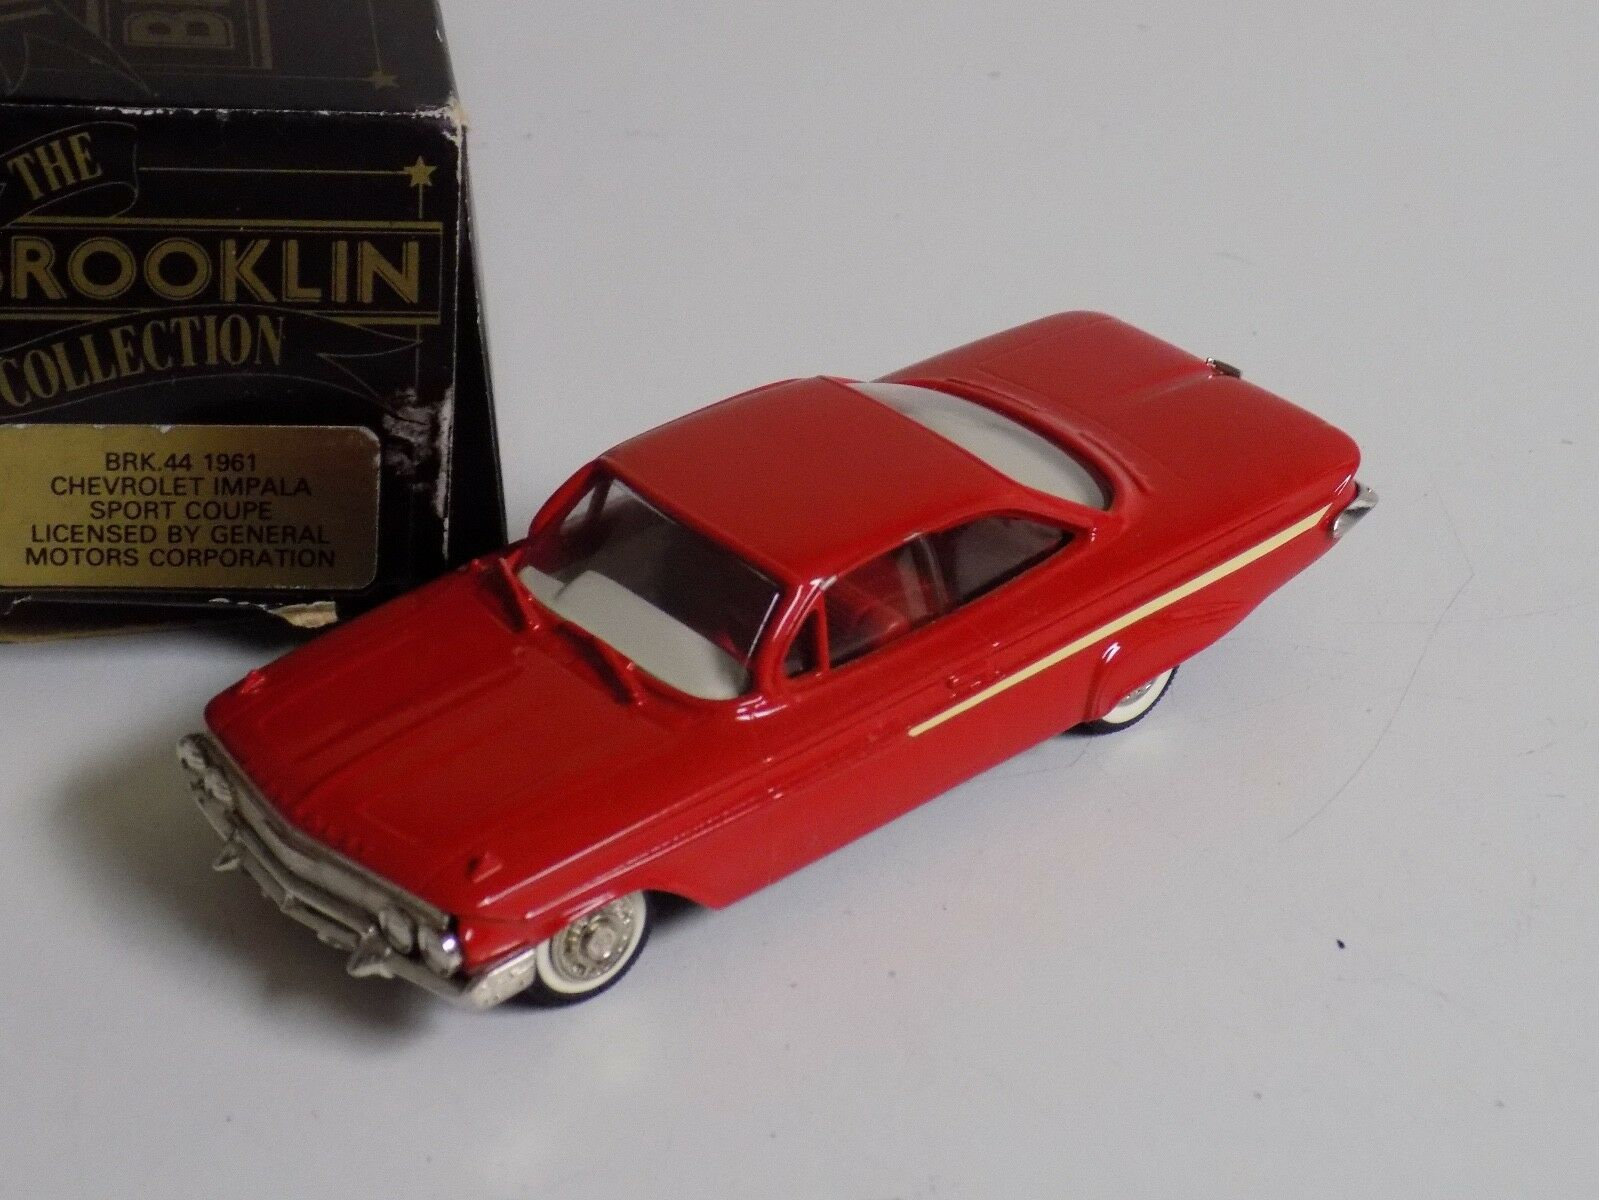 1 43 Brooklin modelos 1961 Chevrolet Impala Sport Coupe BRK Caja Original B44